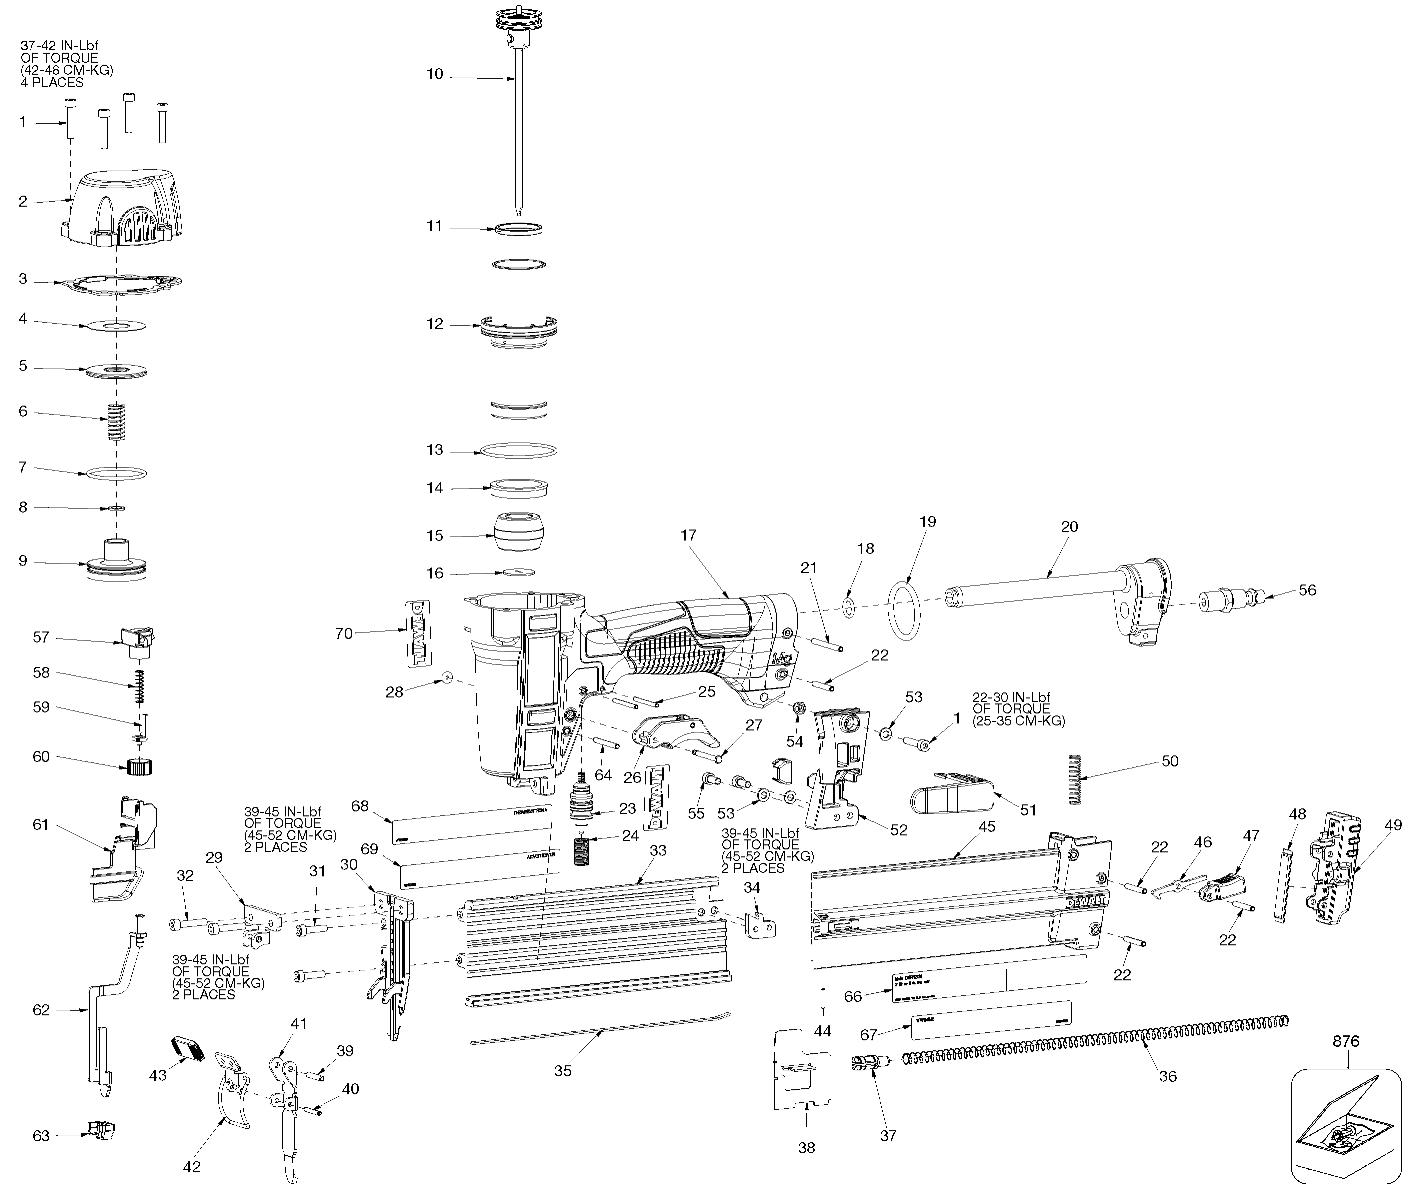 dewalt dwfp12231 parts